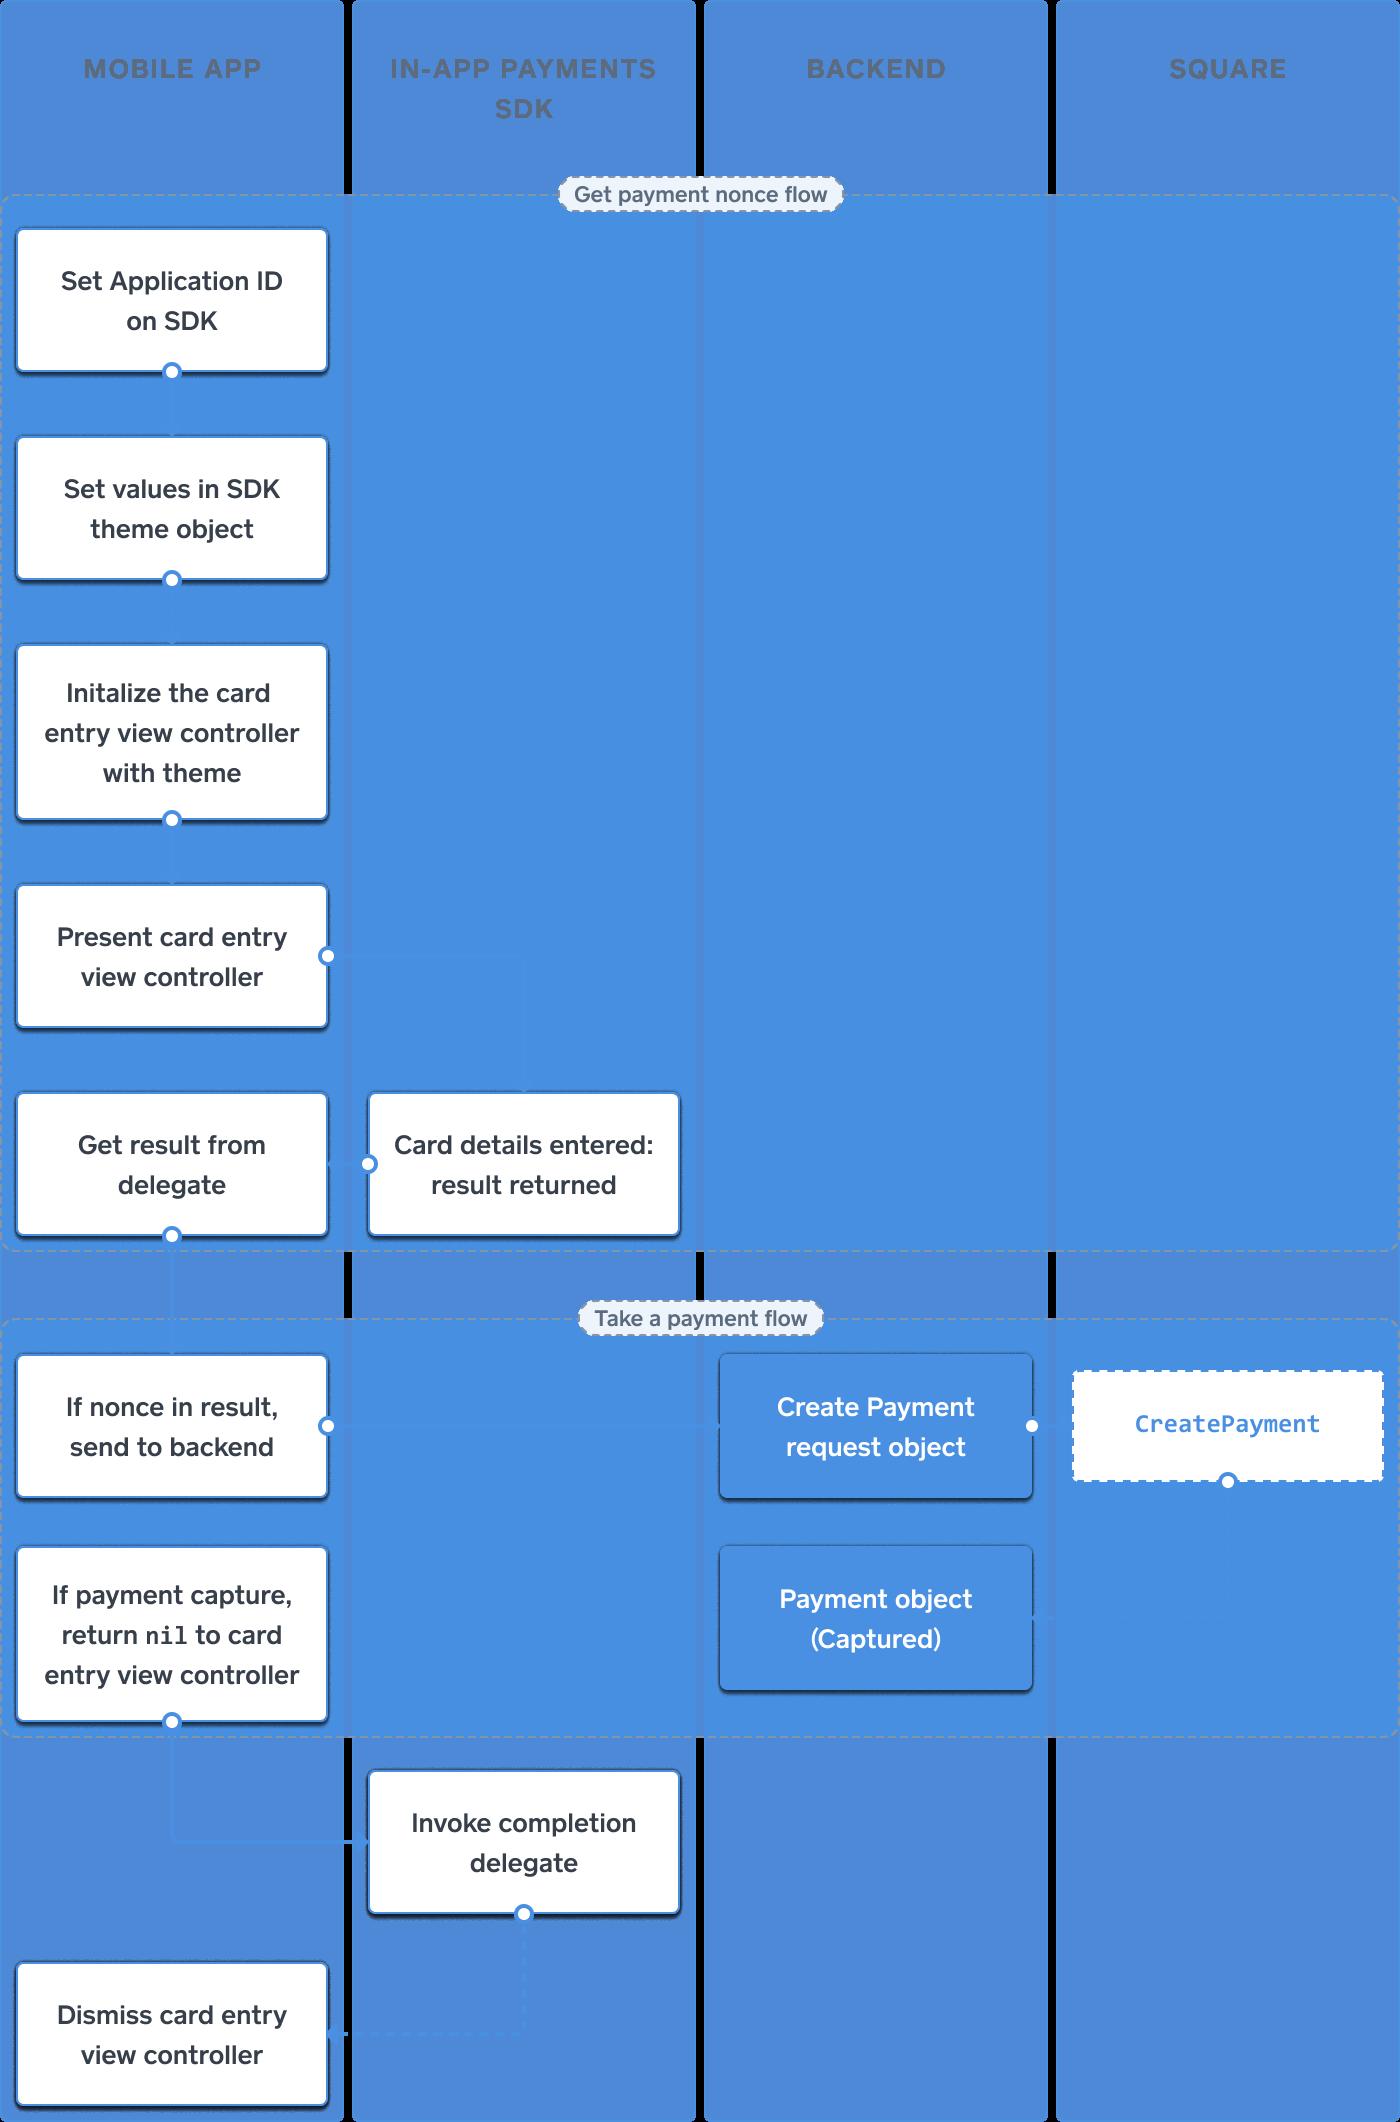 In-App Payments SDK: How It Works